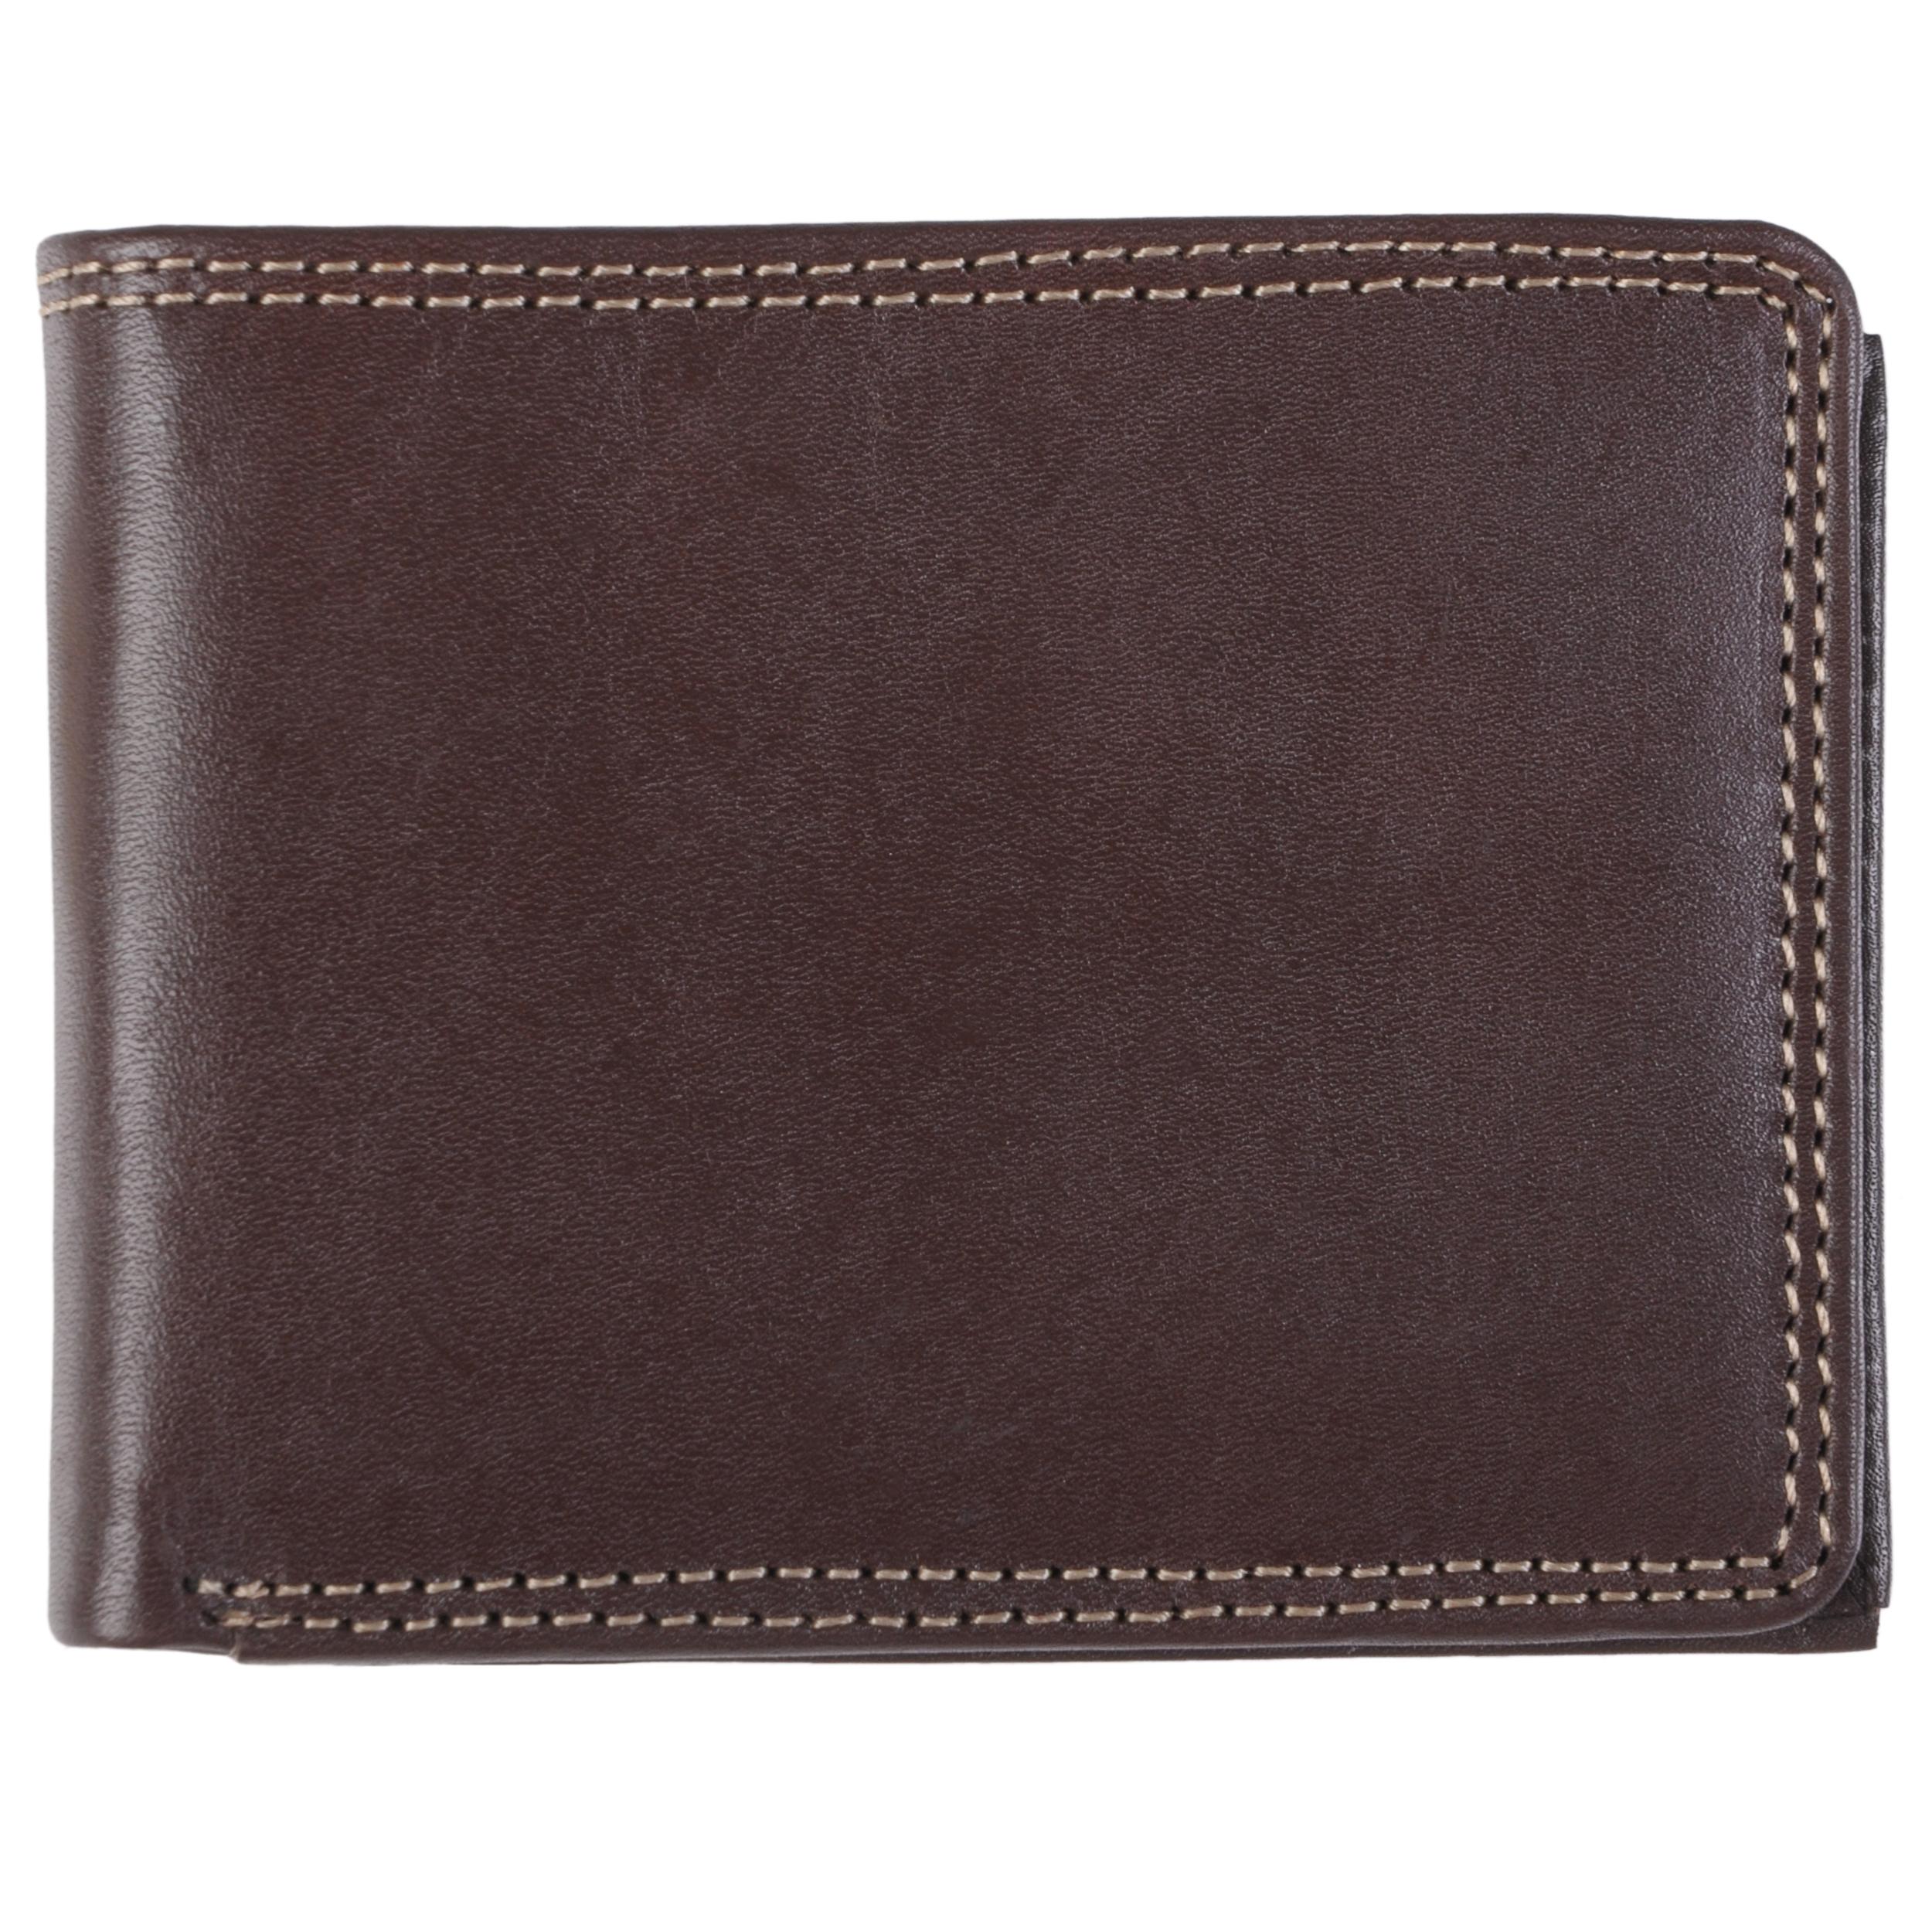 Daxx Daxx Mens Topstitched Bi-fold Genuine Leather Wallet